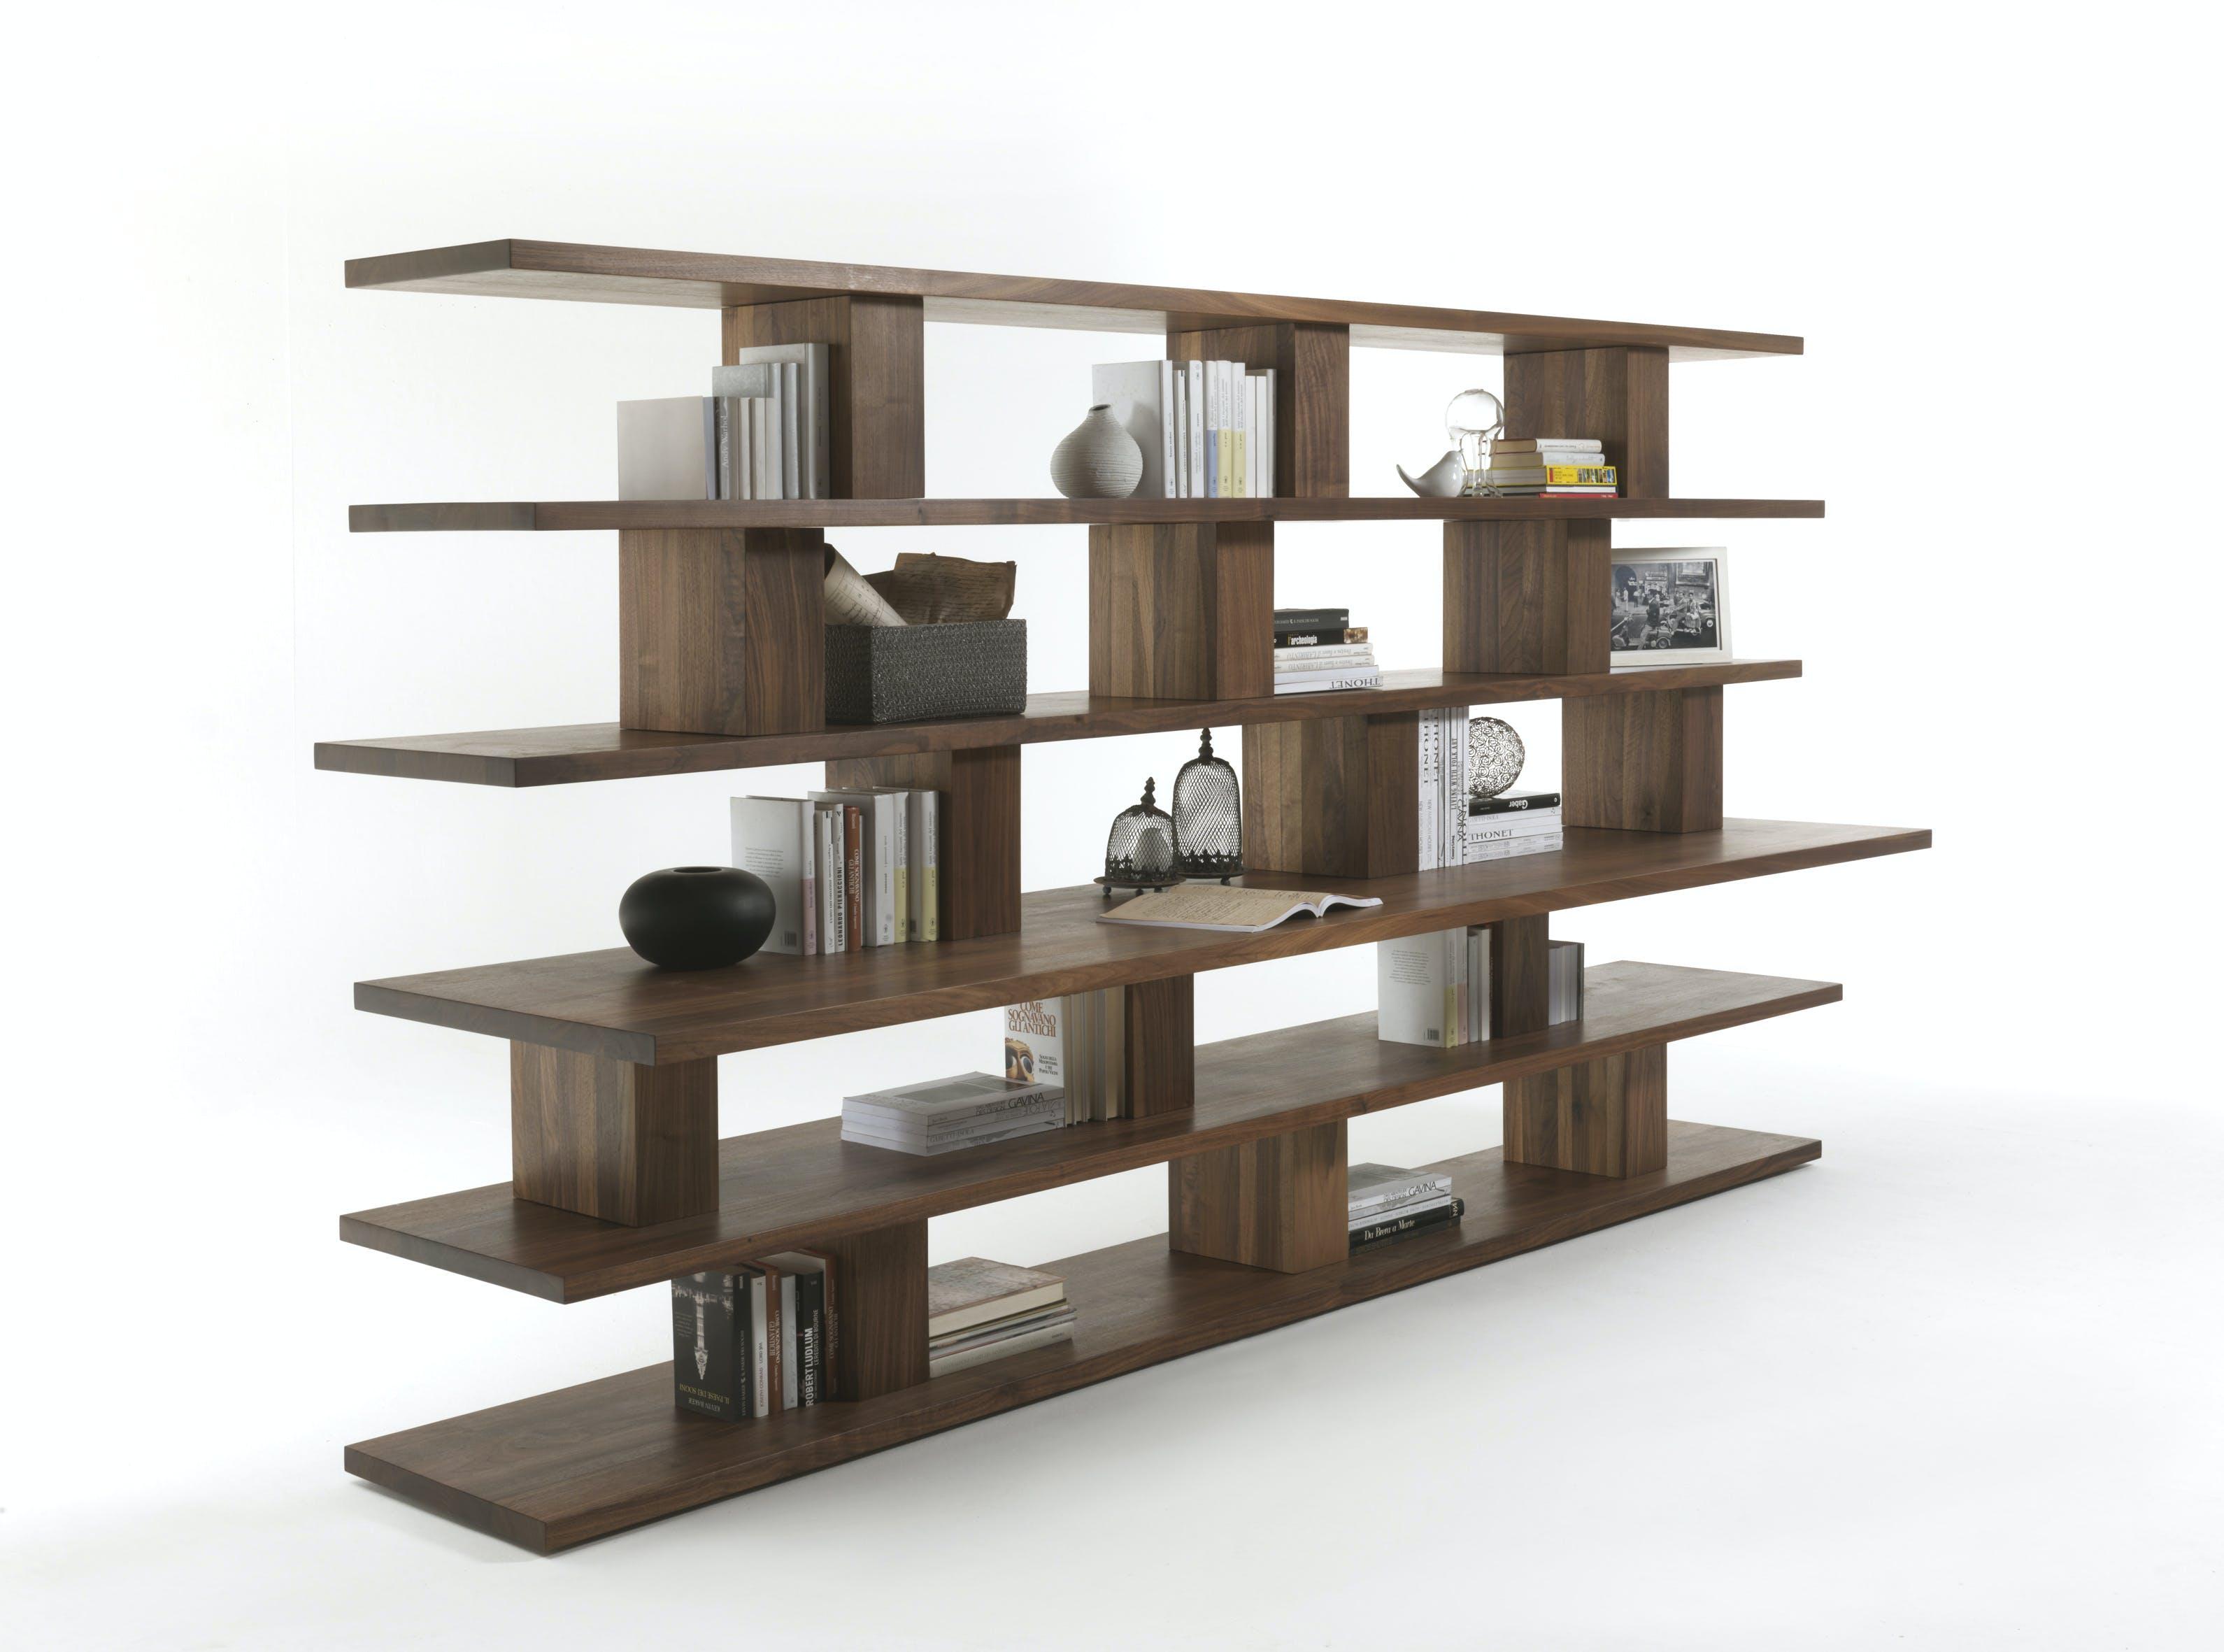 Bookshelf Chipperfield Noc 06